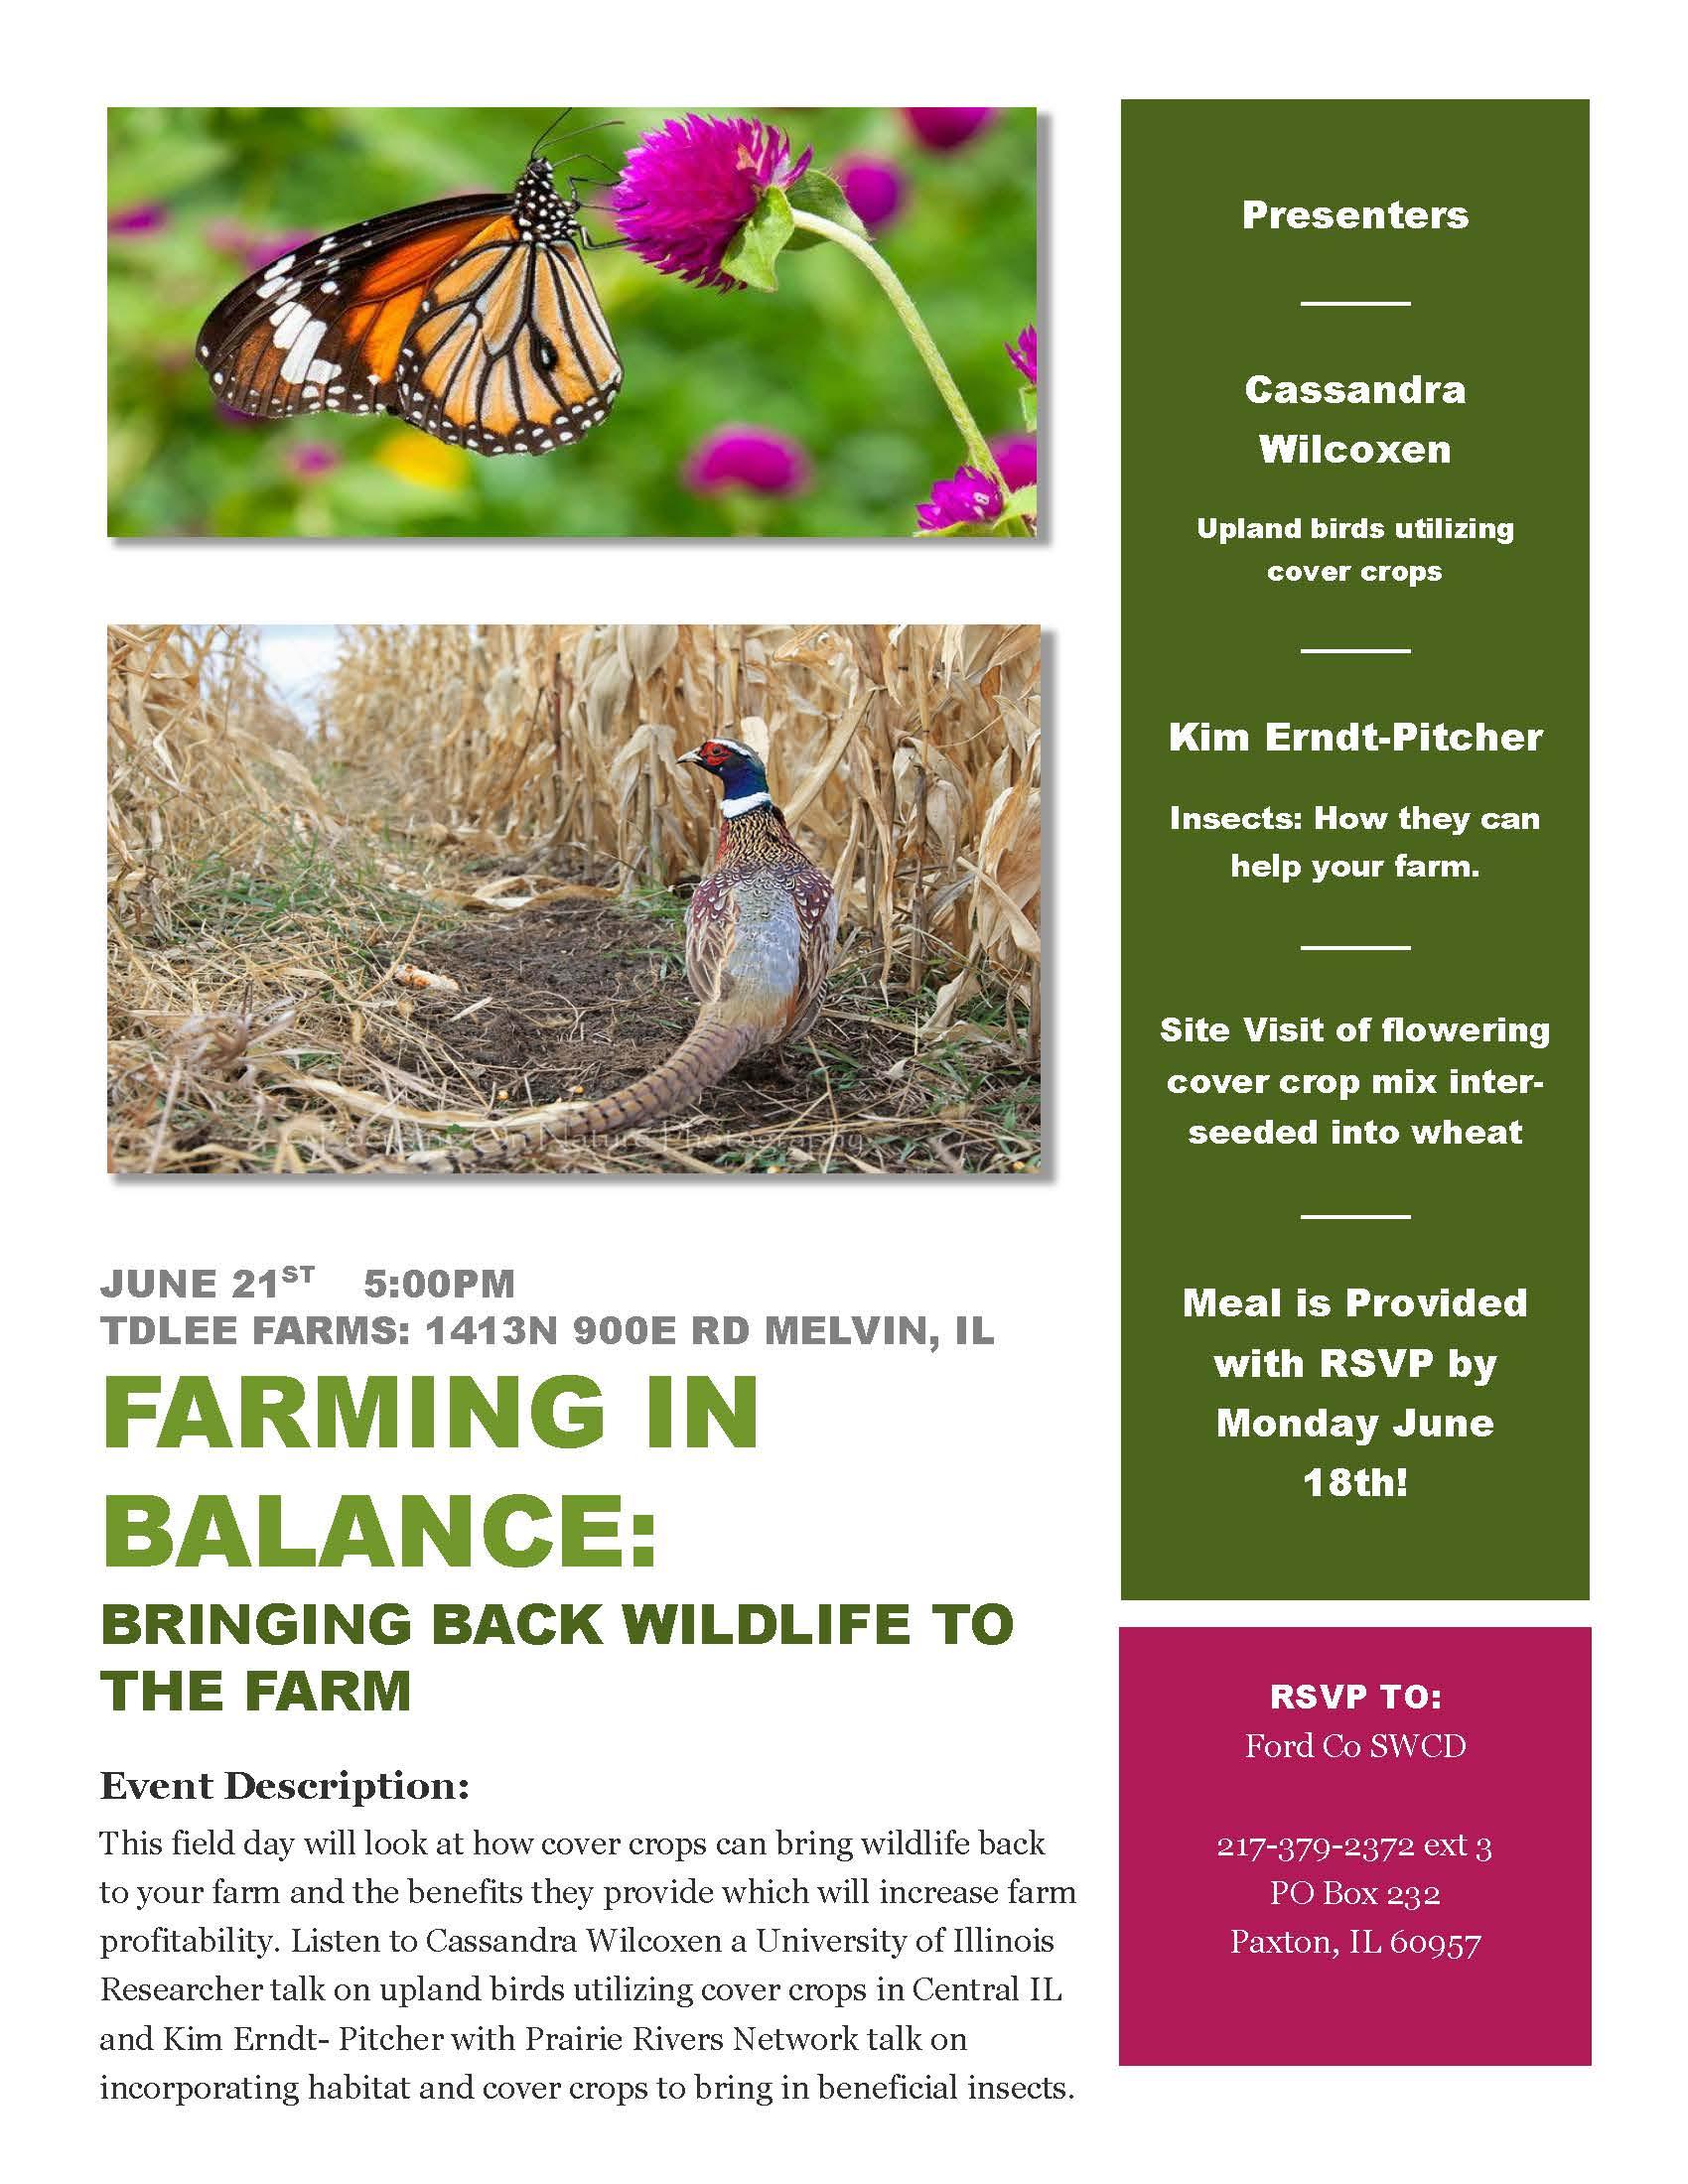 Farming In Balance Bringing Wildlife back to the Farm